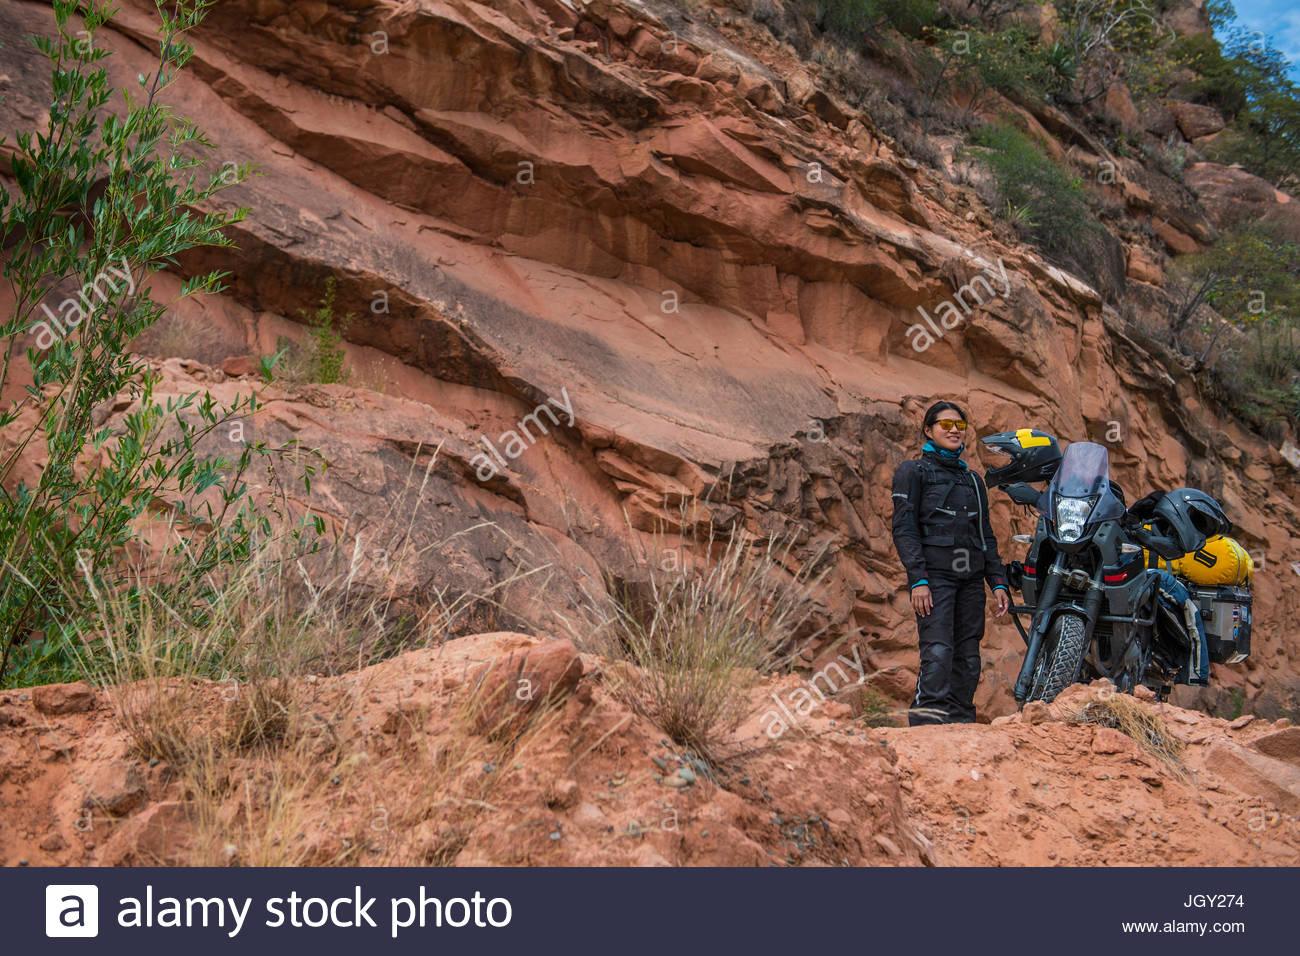 Woman standing next to touring motorbike, Potosi, Bolivia - Stock Image